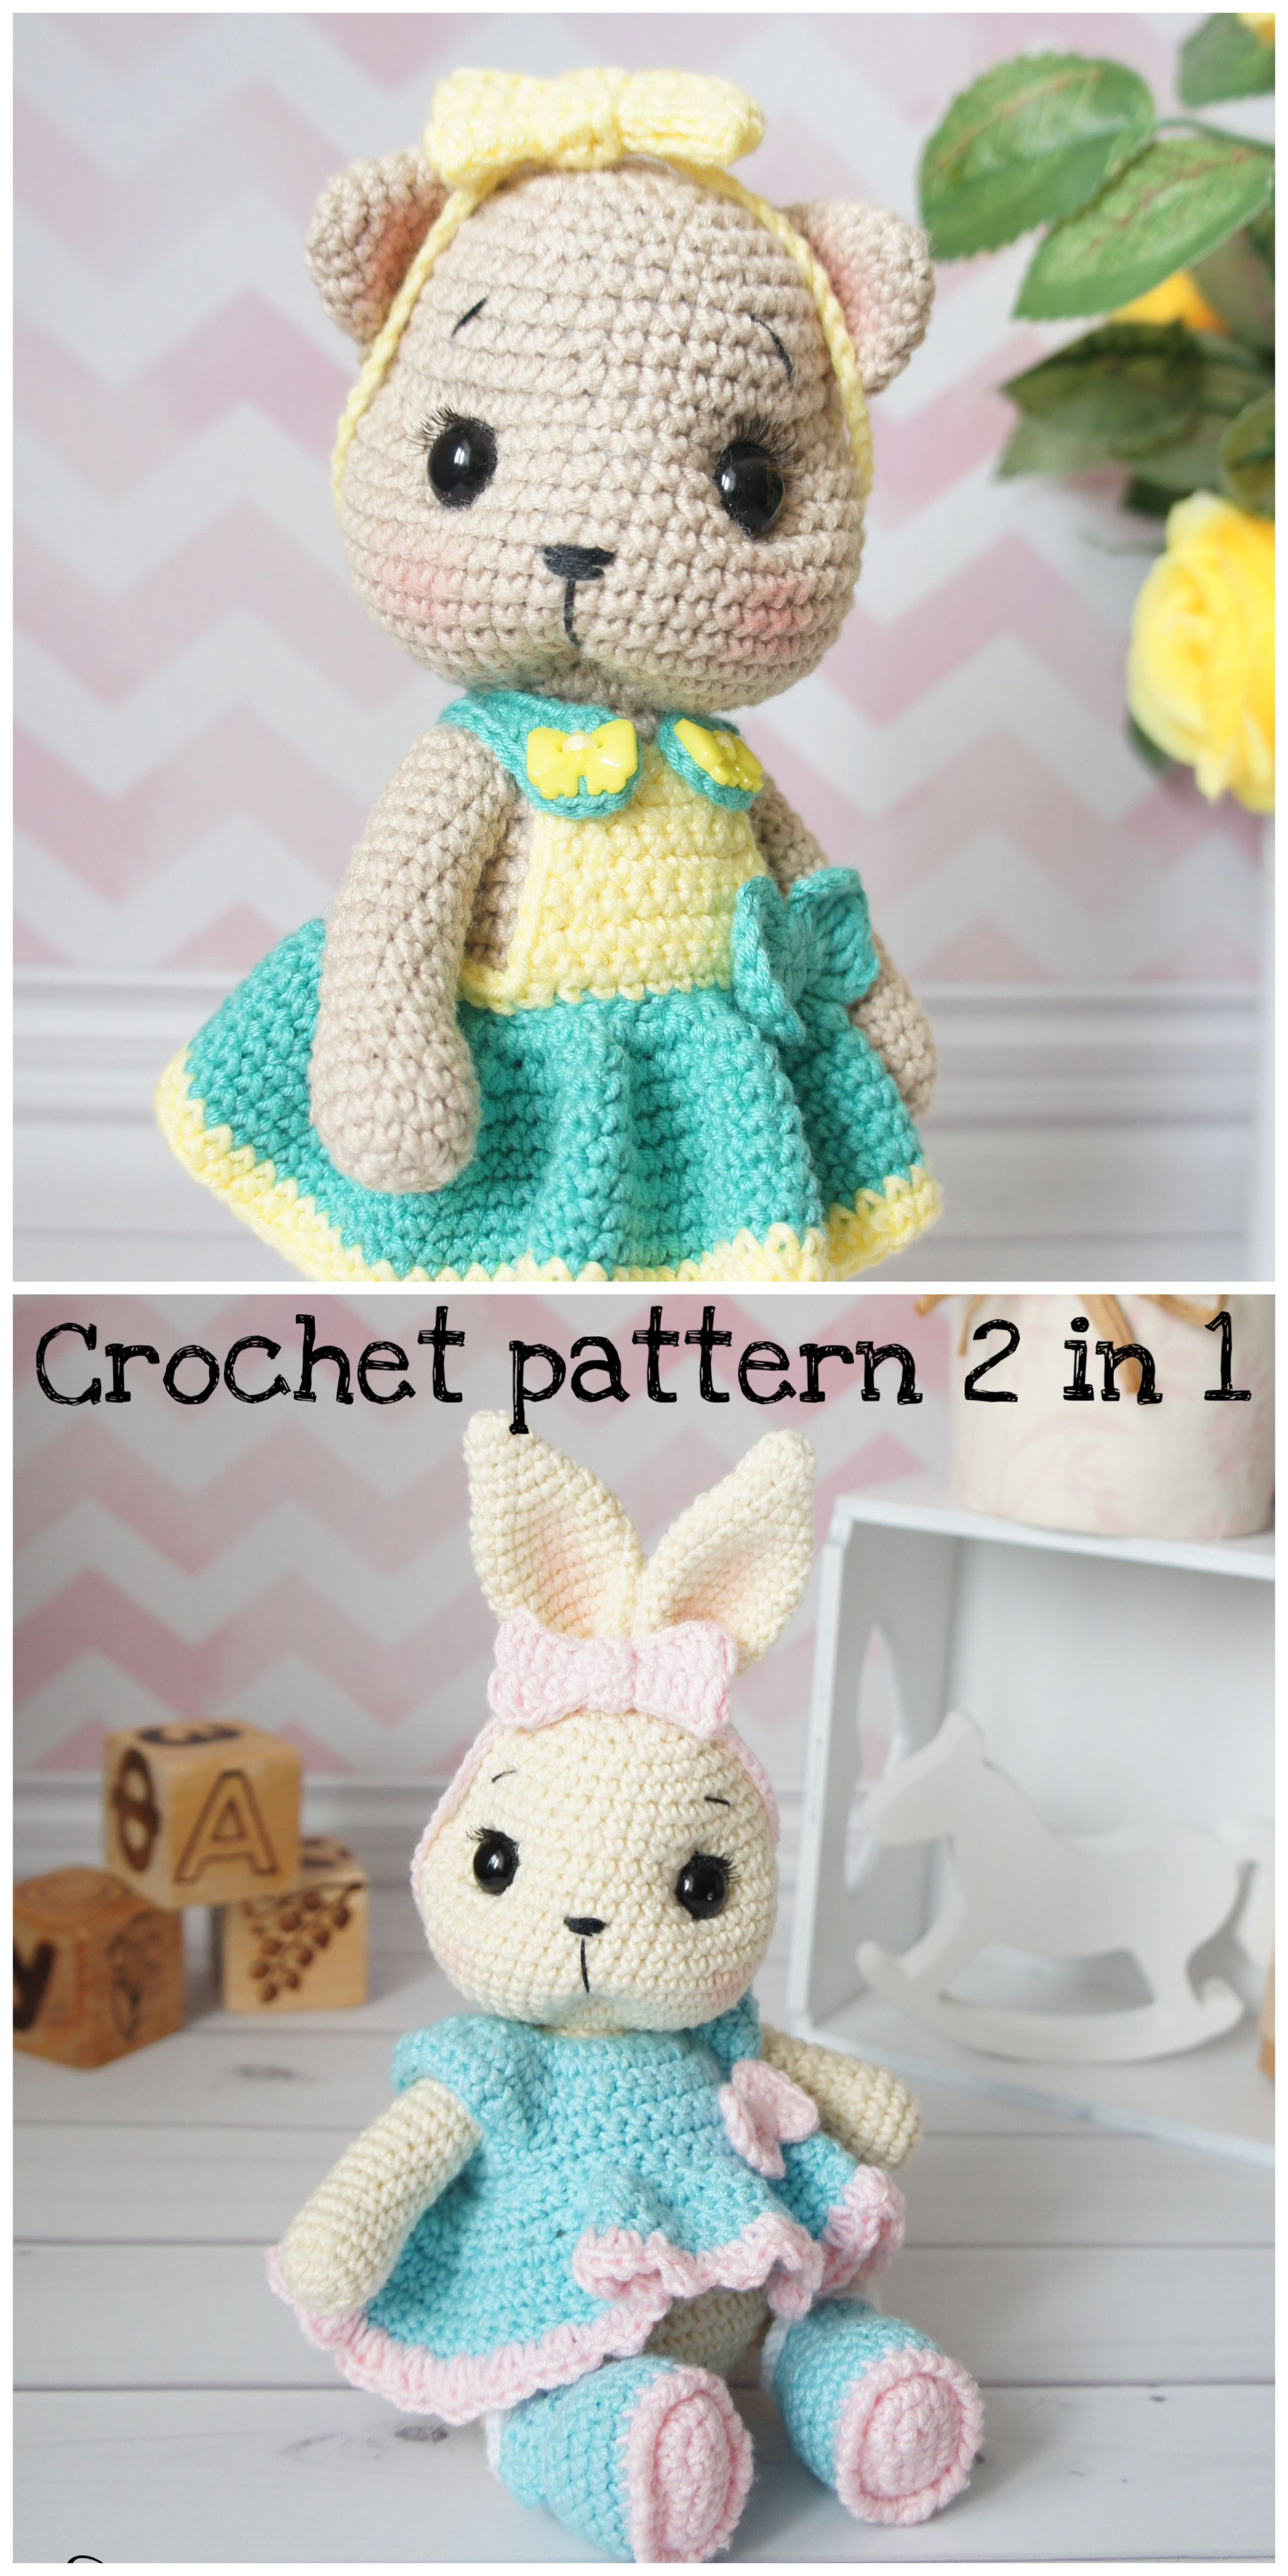 Crochet Pattern 2 In 1 Bunny Crochet Pattern And Kitten Etsy In 2020 Crochet Patterns Crochet Crochet Toys Patterns